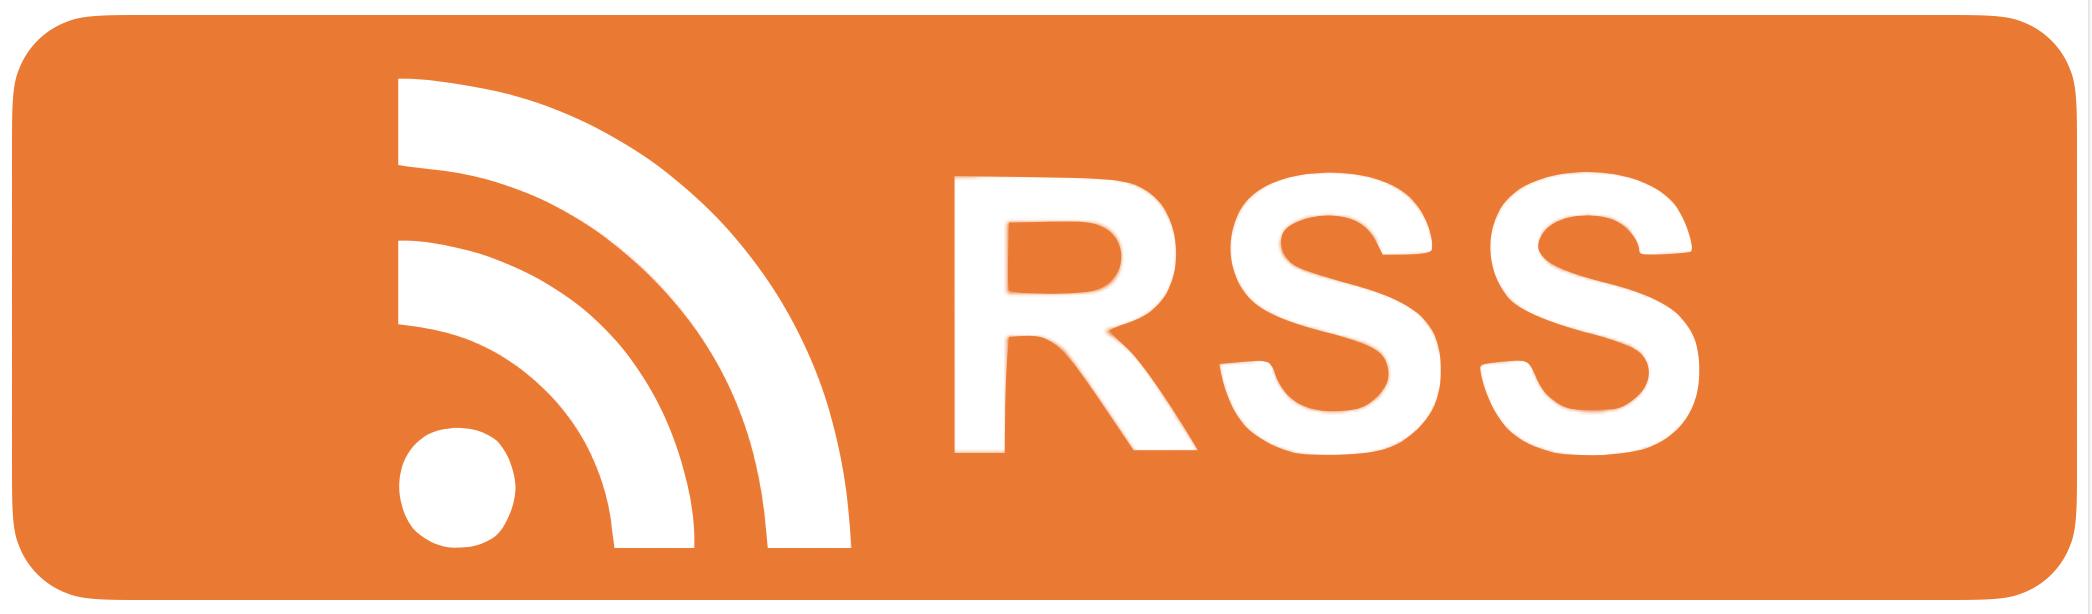 RSS Podcast logo